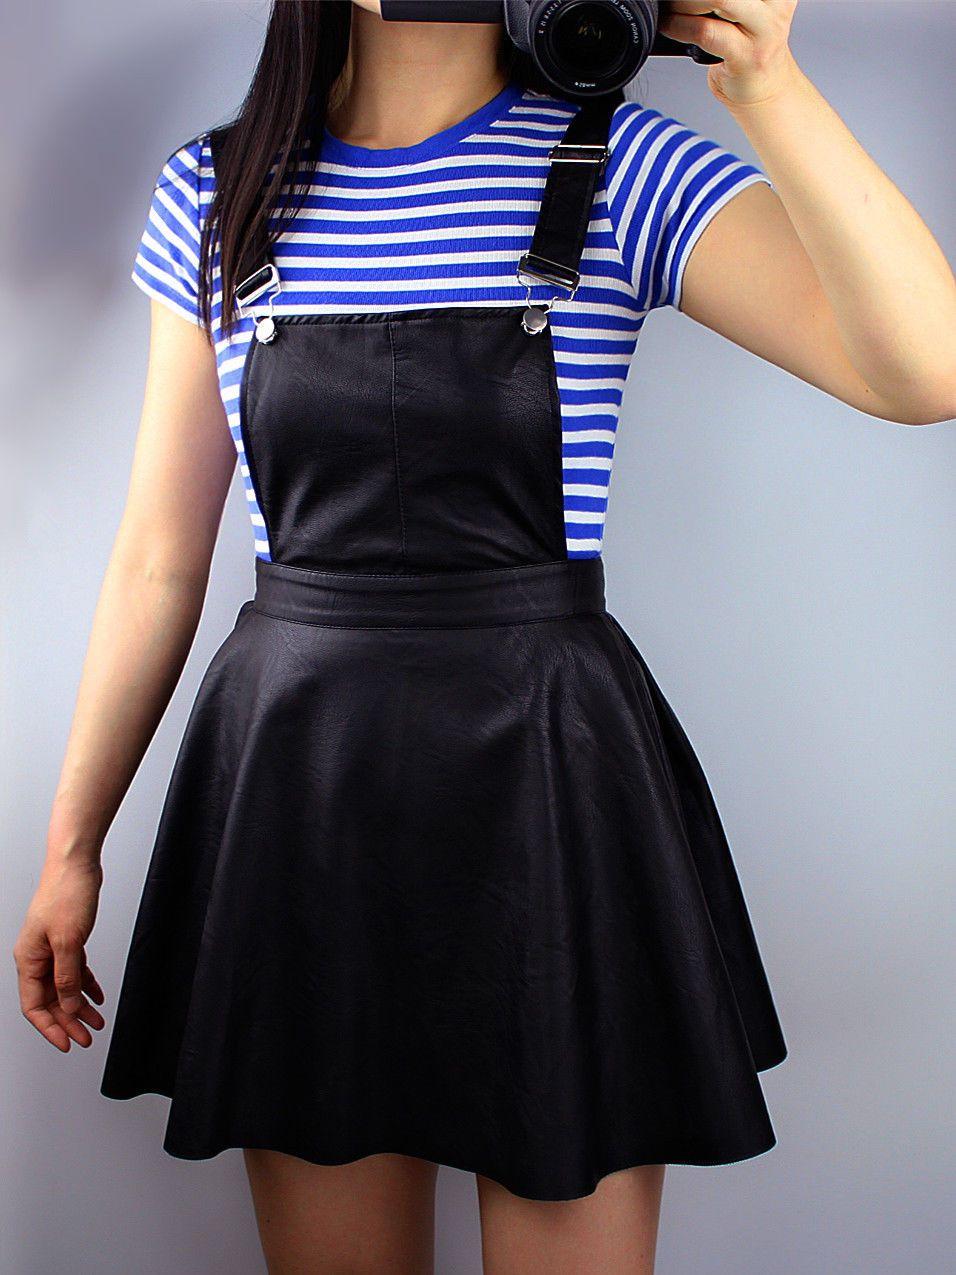 982c0fa7b1 Flippy Skater Skirt Leather Black Short Mini Aline Pinafore Dress Overalls  Strap